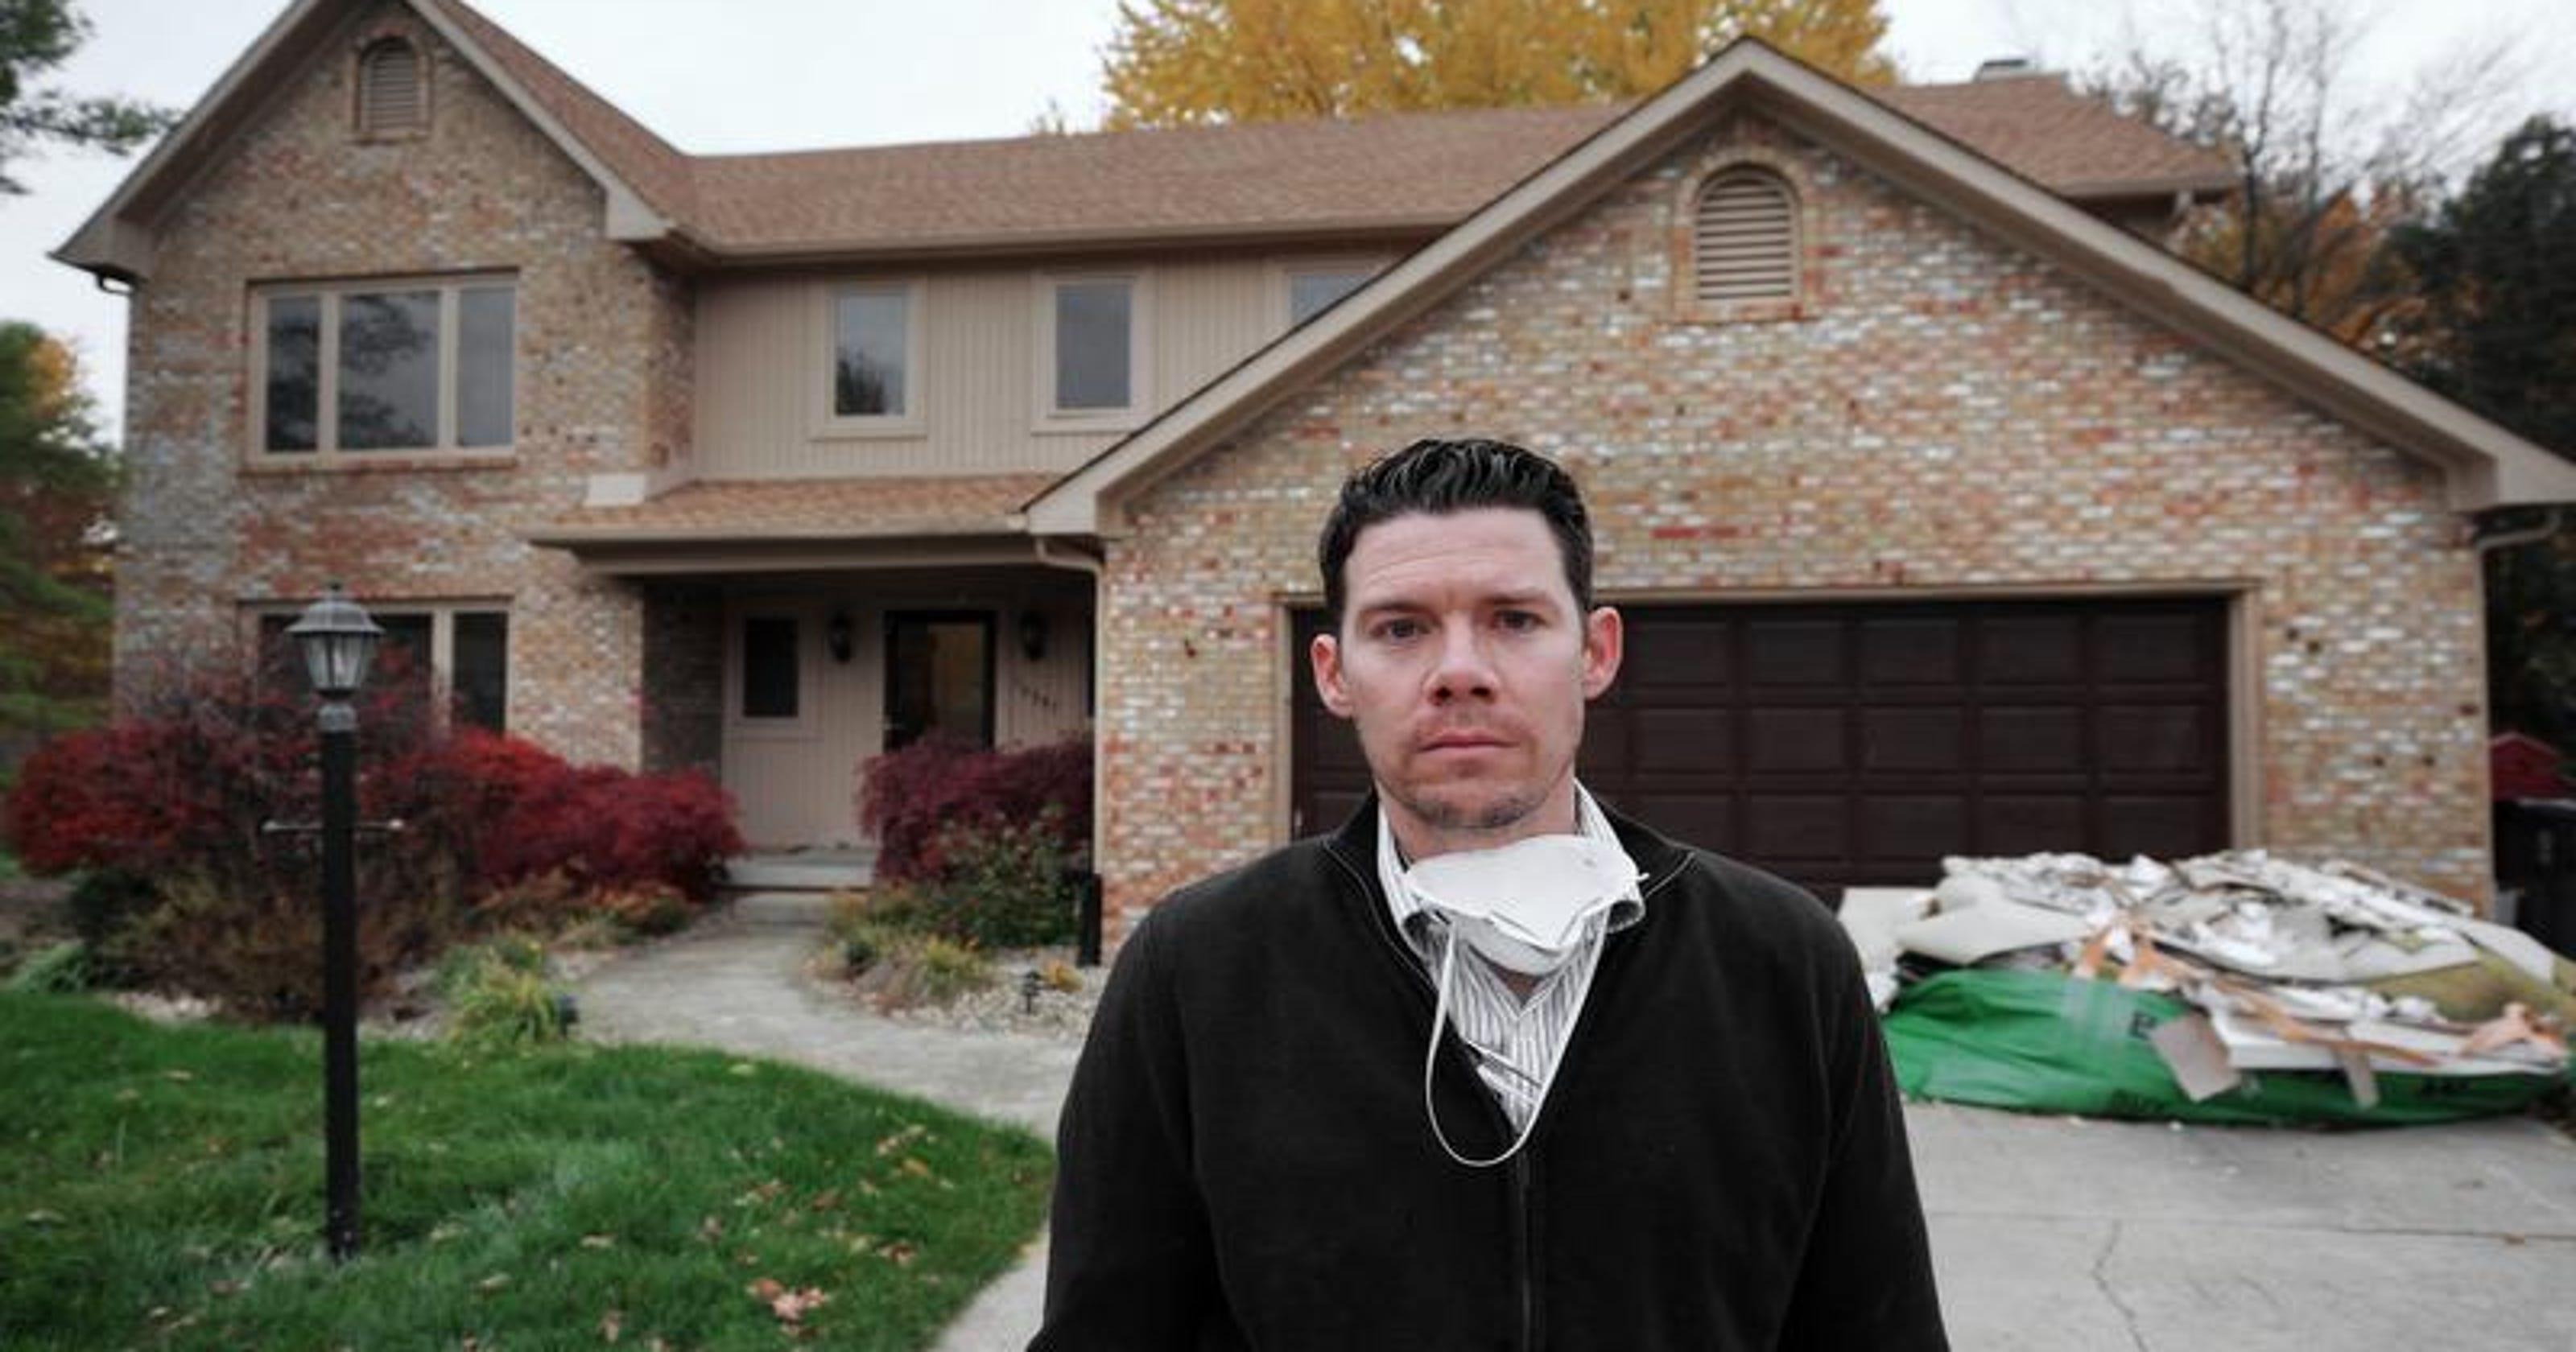 Buyer beware: Rampant mold ruins Carmel couple's dream home